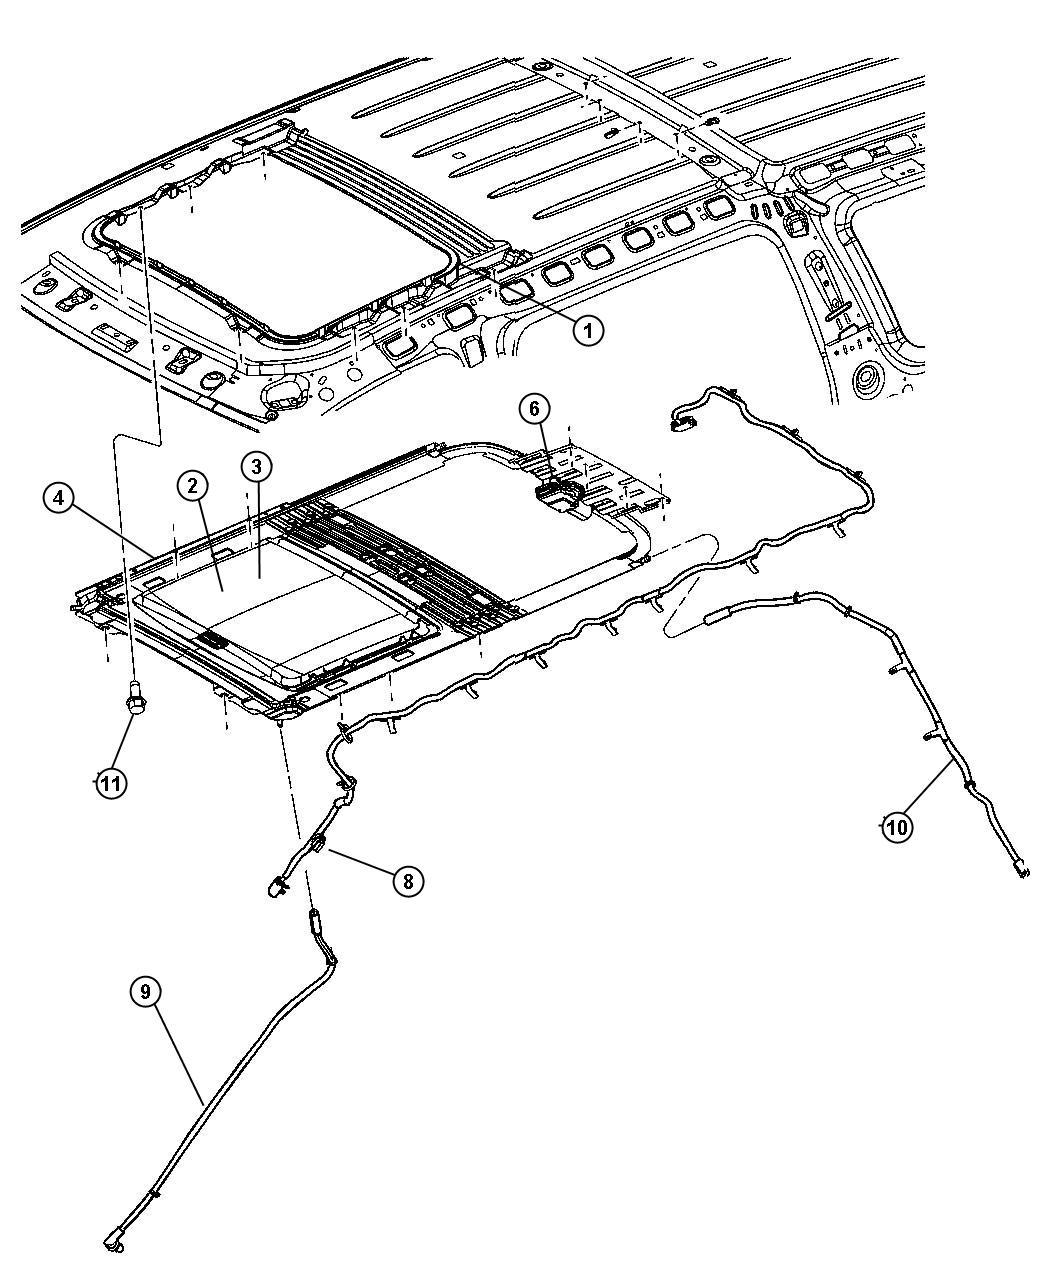 2004 Dodge Durango Parts Diagram • Wiring Diagram For Free